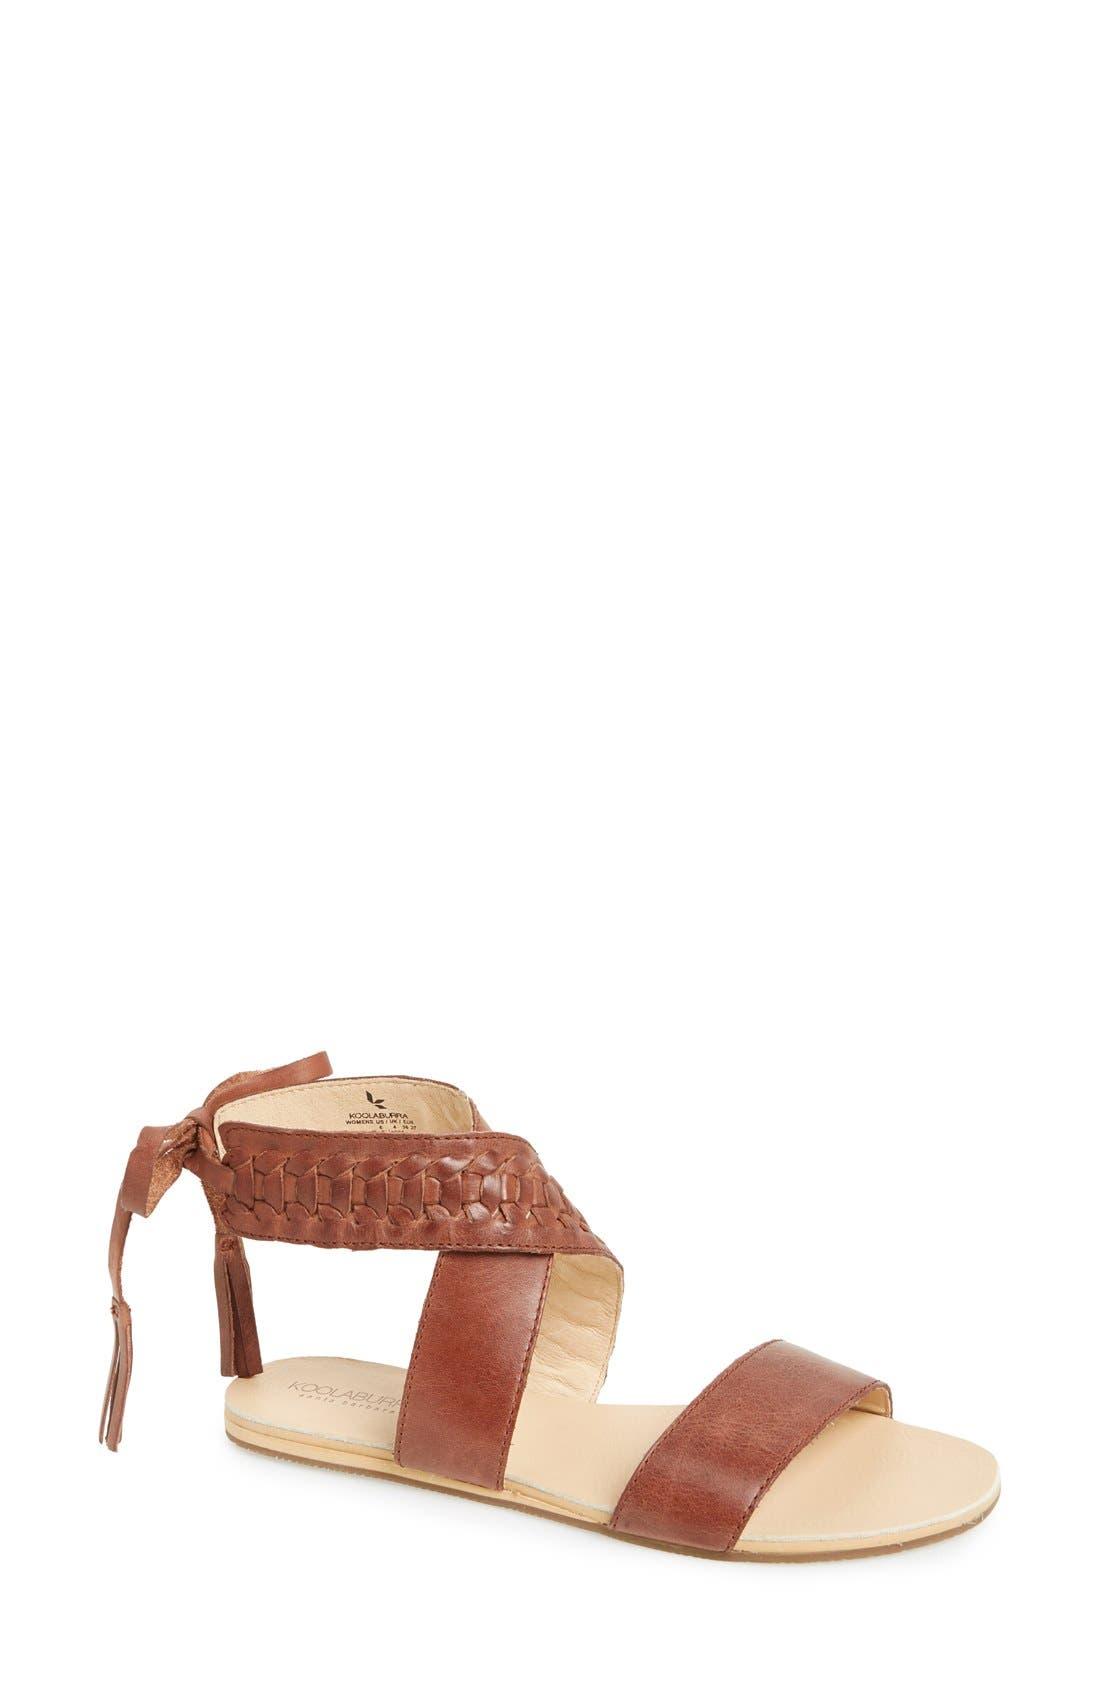 Alternate Image 1 Selected - Koolaburra 'Alexa' Leather Ankle Strap Sandal (Women)